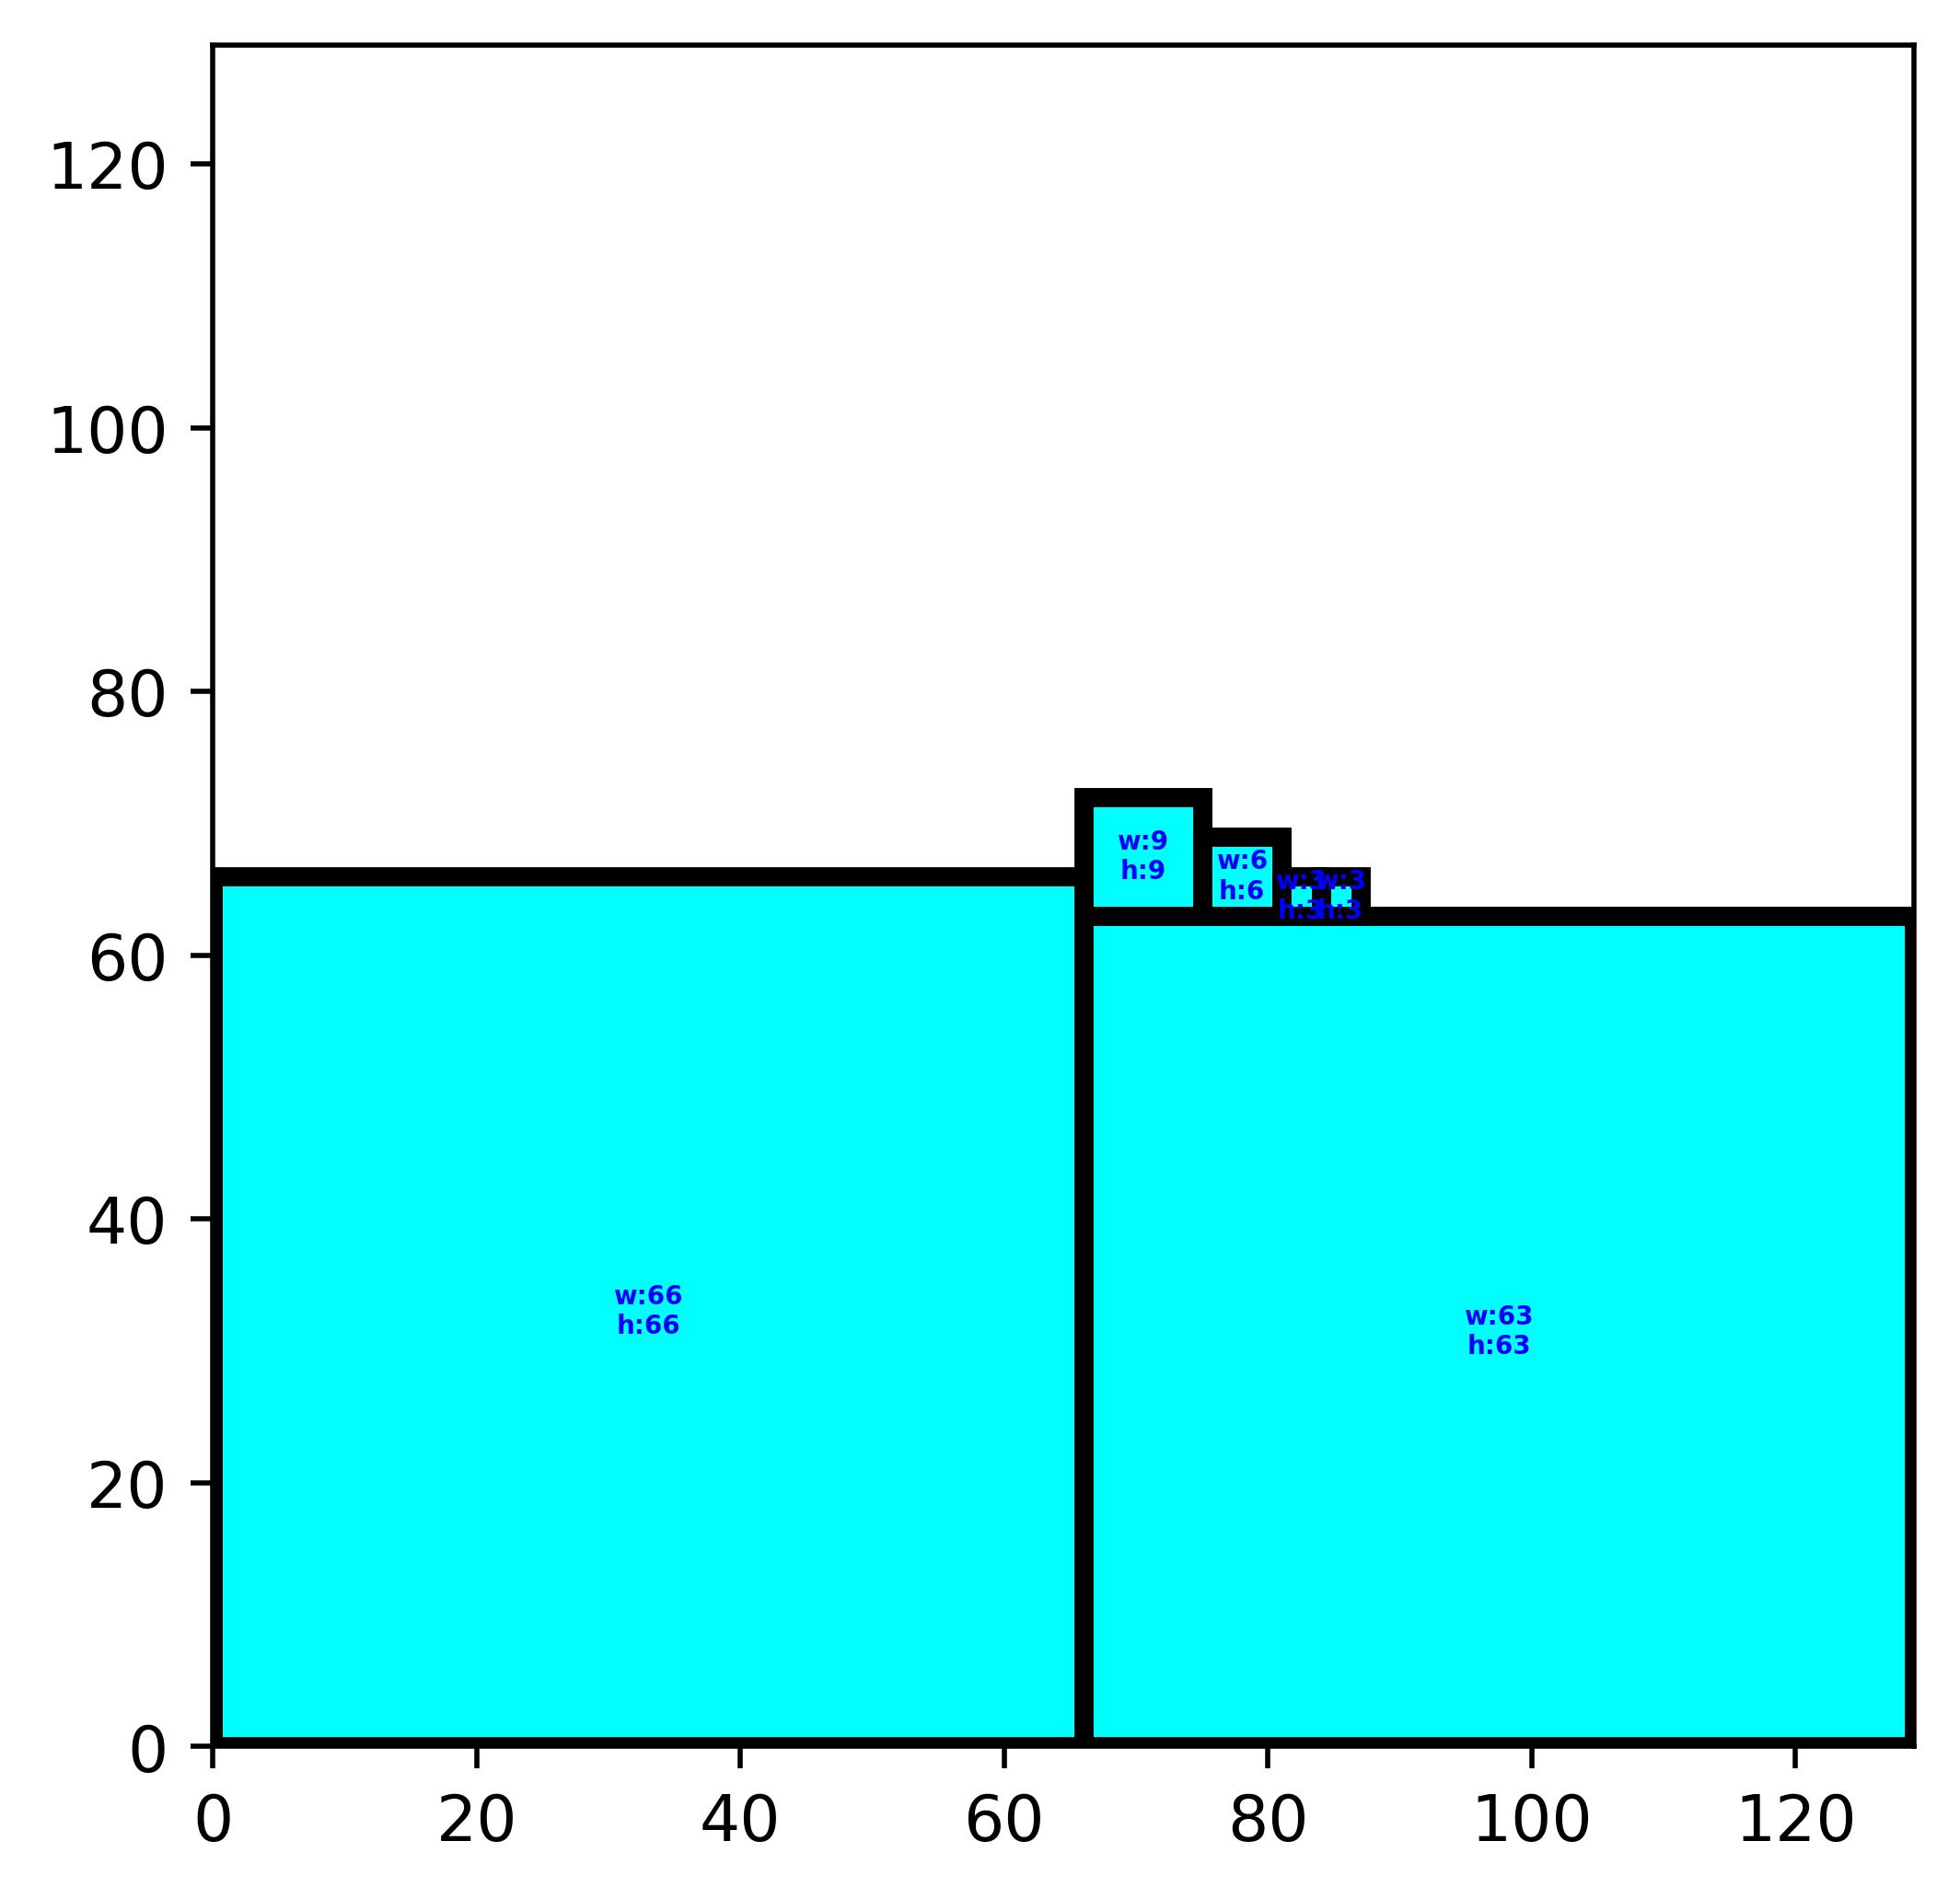 optimization_algo/packing_screenshots/AlphaGoZero/pack_size_129/penalty_constant_0/k=6_max=17280_latency=102617.png